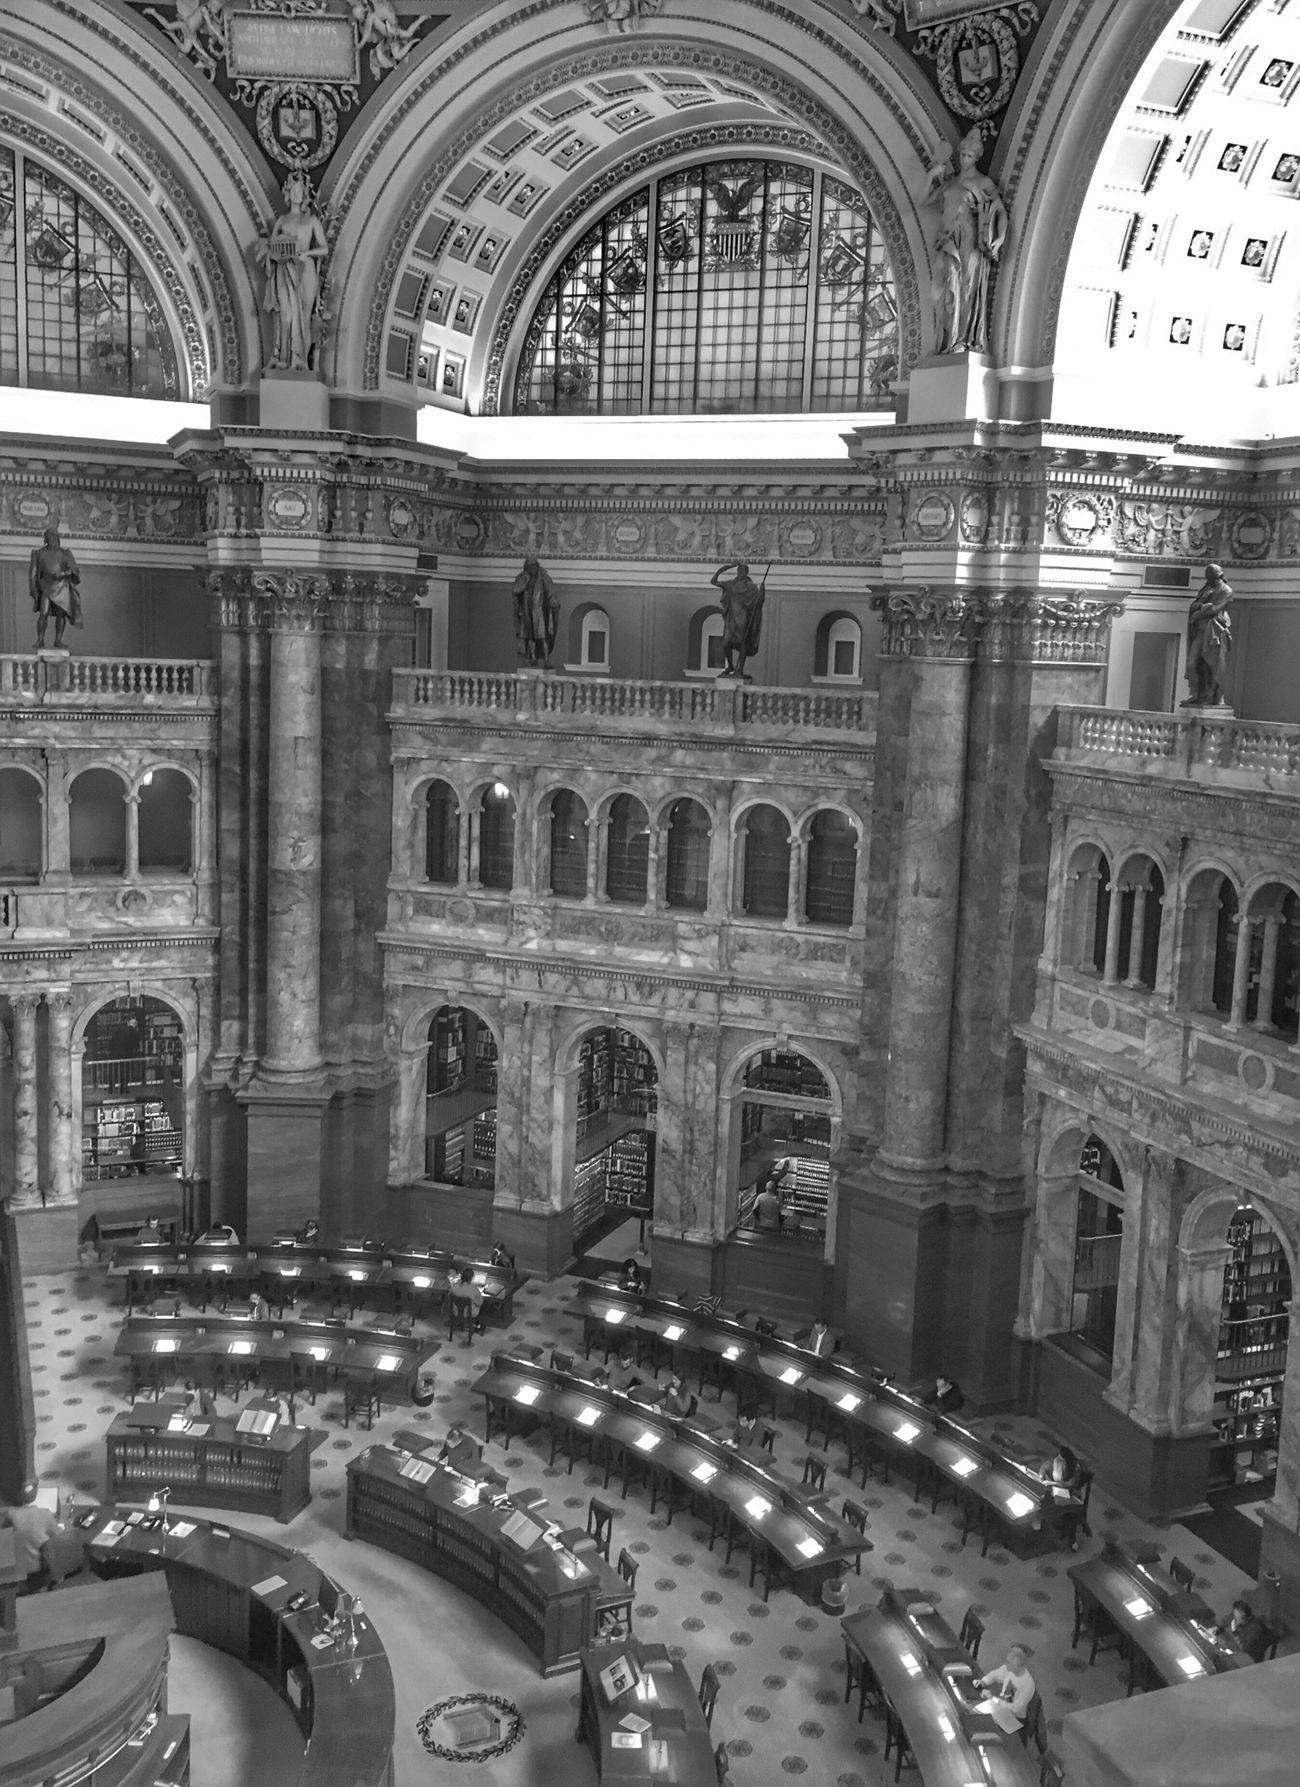 Library Architecture Blackandwhite Bw_collection Bnw EyeEm Best Shots - Black + White Architectural Column